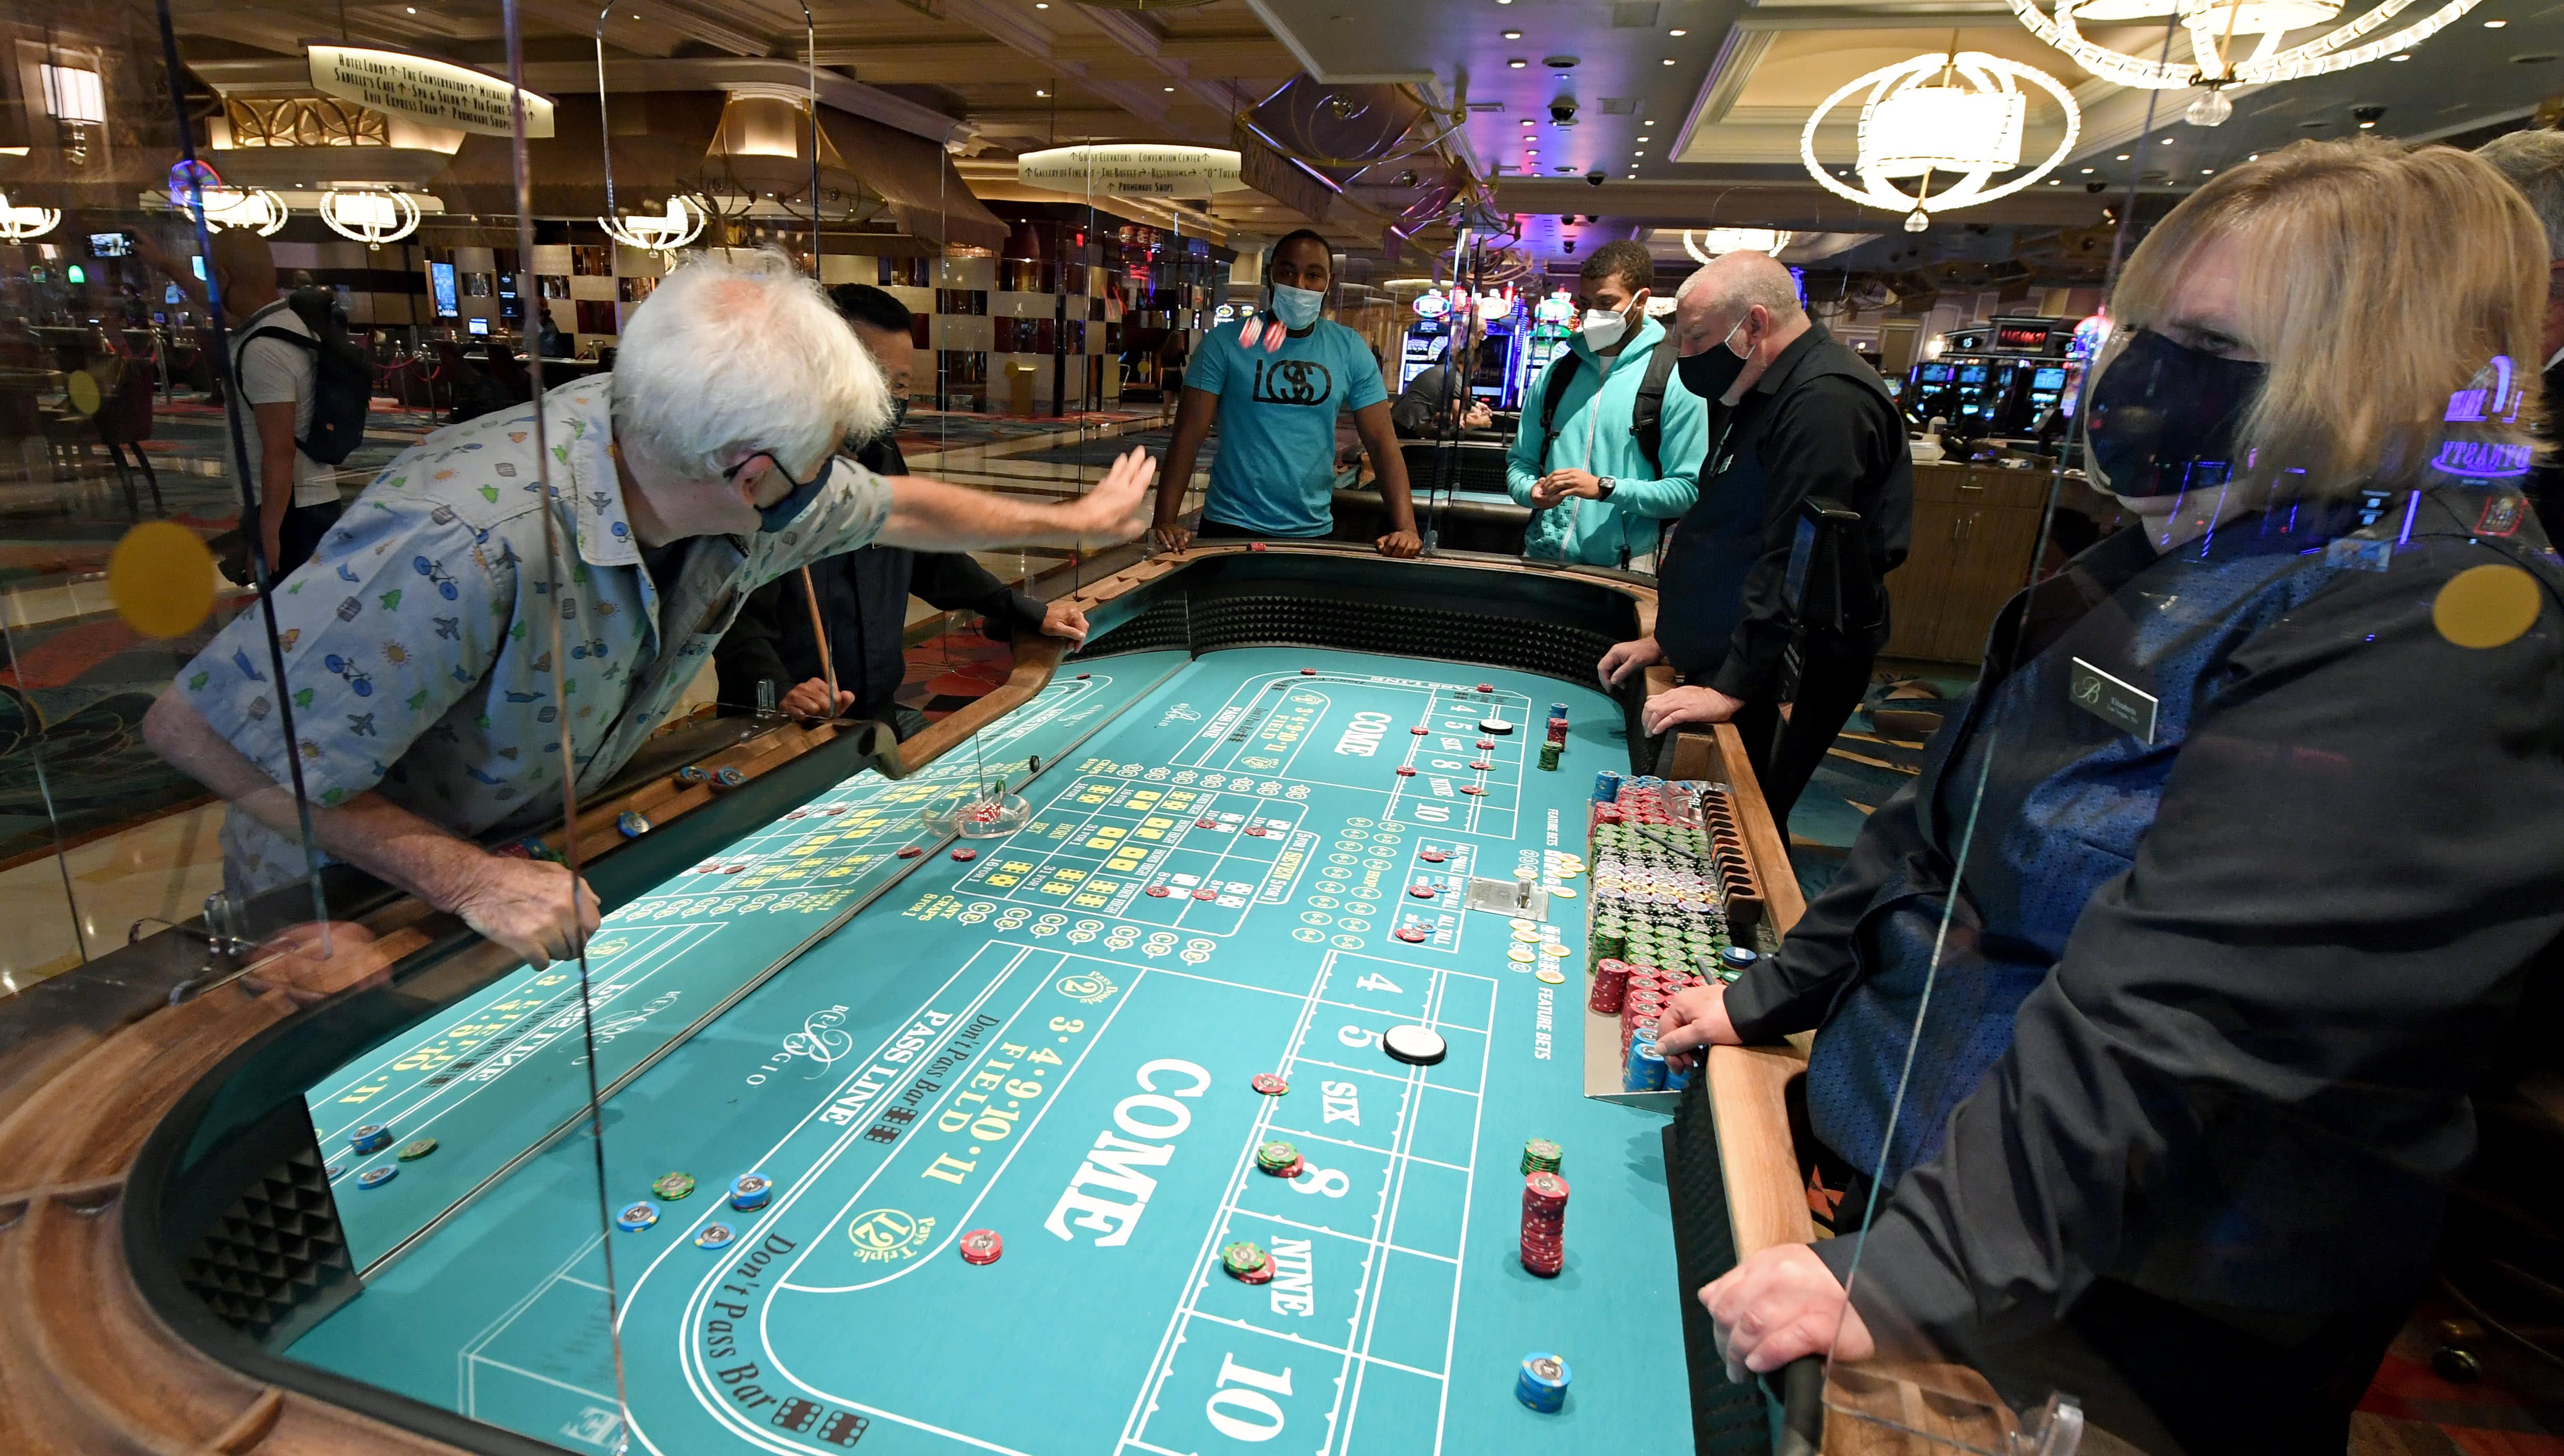 Casinos are seeing strong sales despite social distancing, Circa Resort CEO says